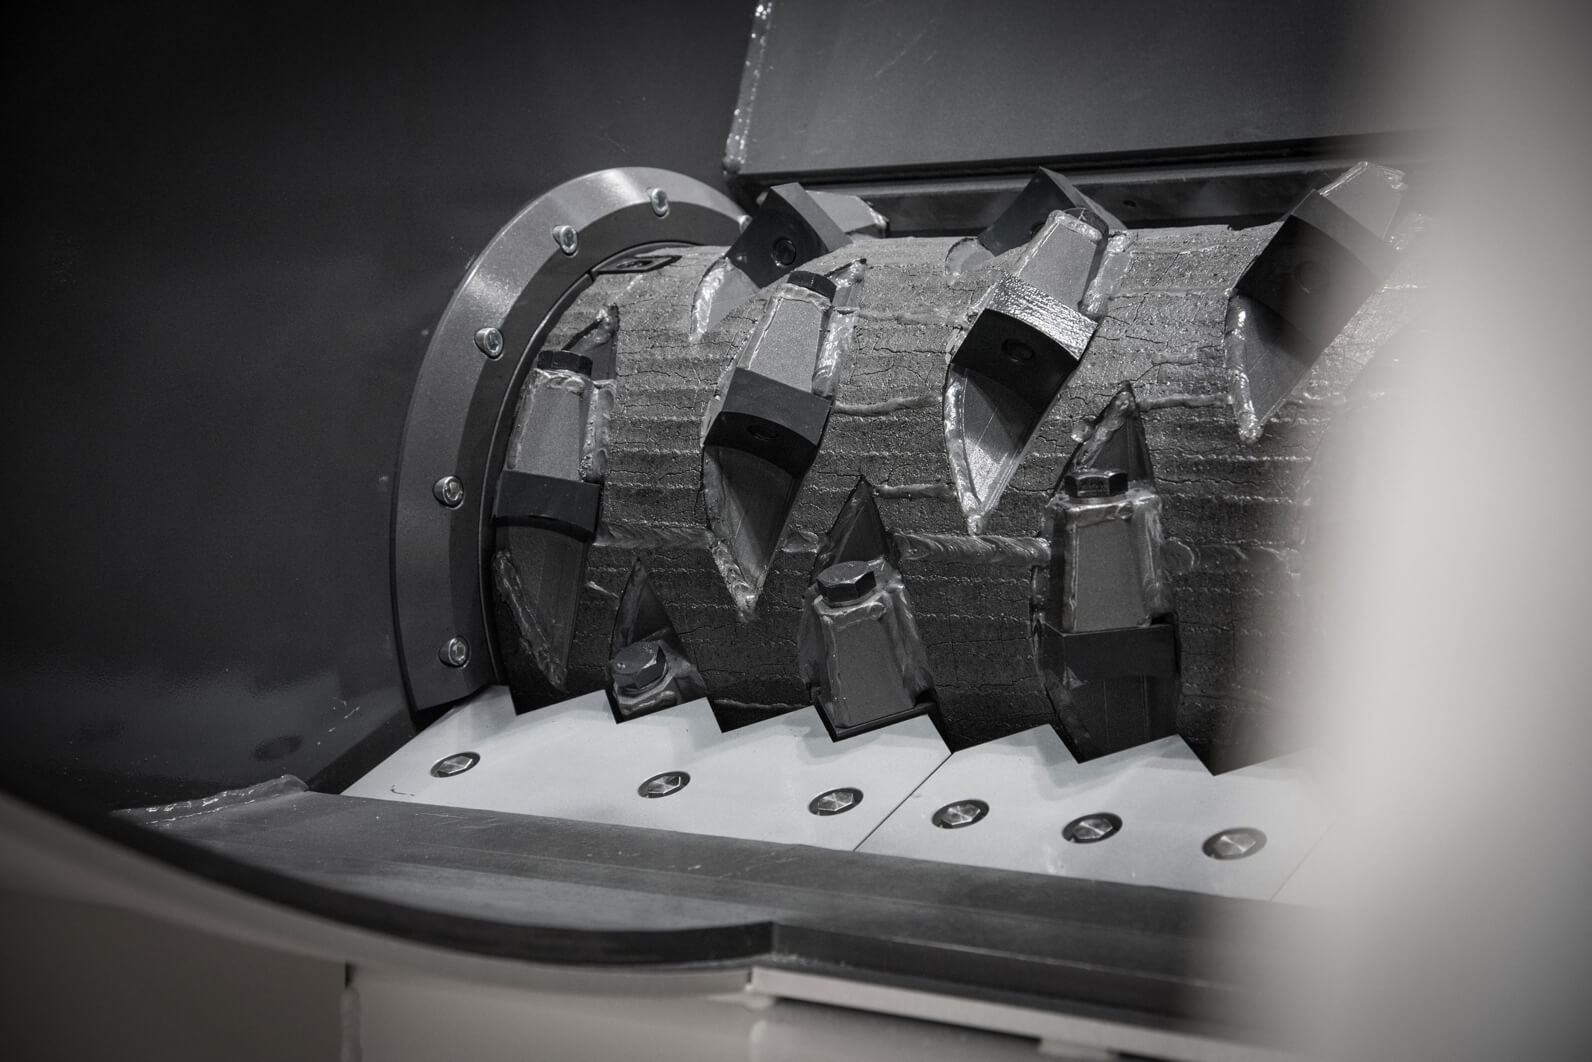 Weima machine afbeelding van shredder mes